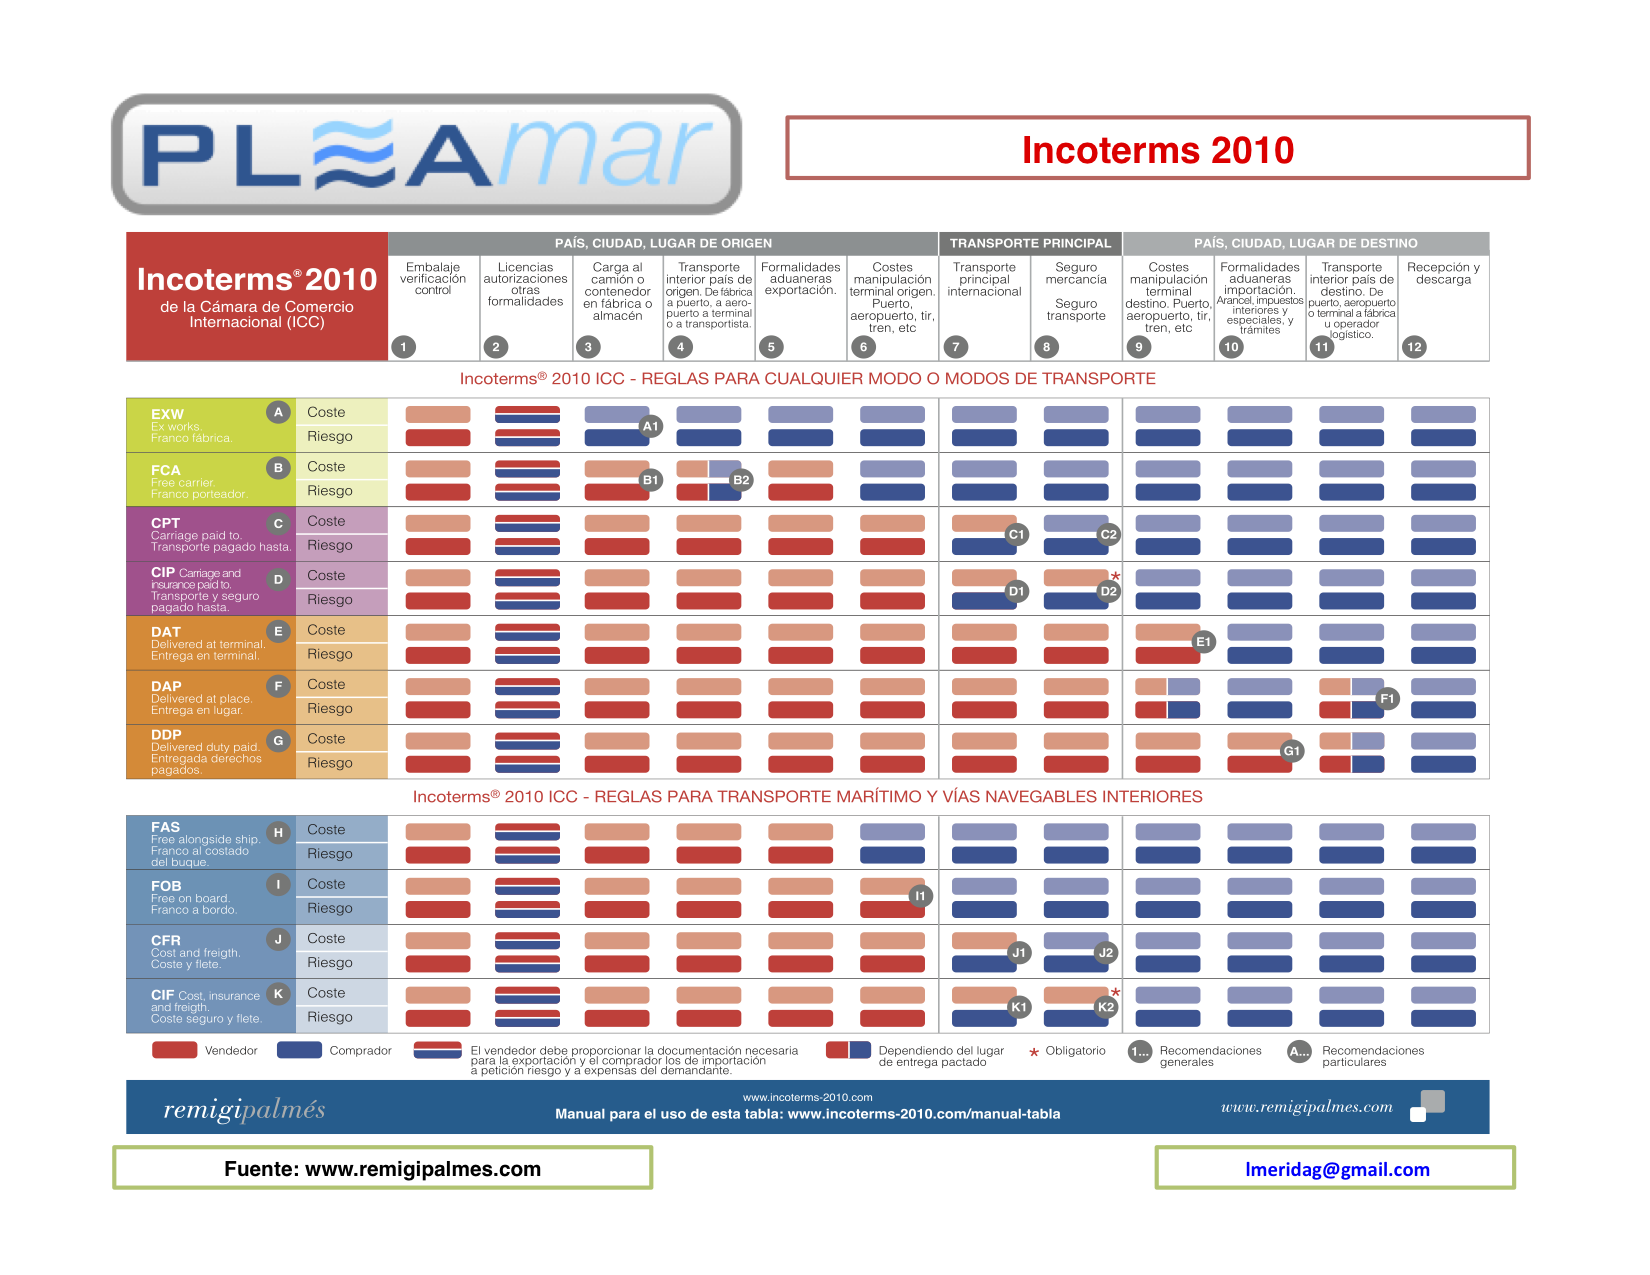 2015 Printable Incoterms further Incoterms 2010 Chart as well Conship Logistics GmbH Incoterms 2010 moreover Incoterms 2010 Chart in addition Incoterms 2010 Quick Reference Chart. on incoterms 2010